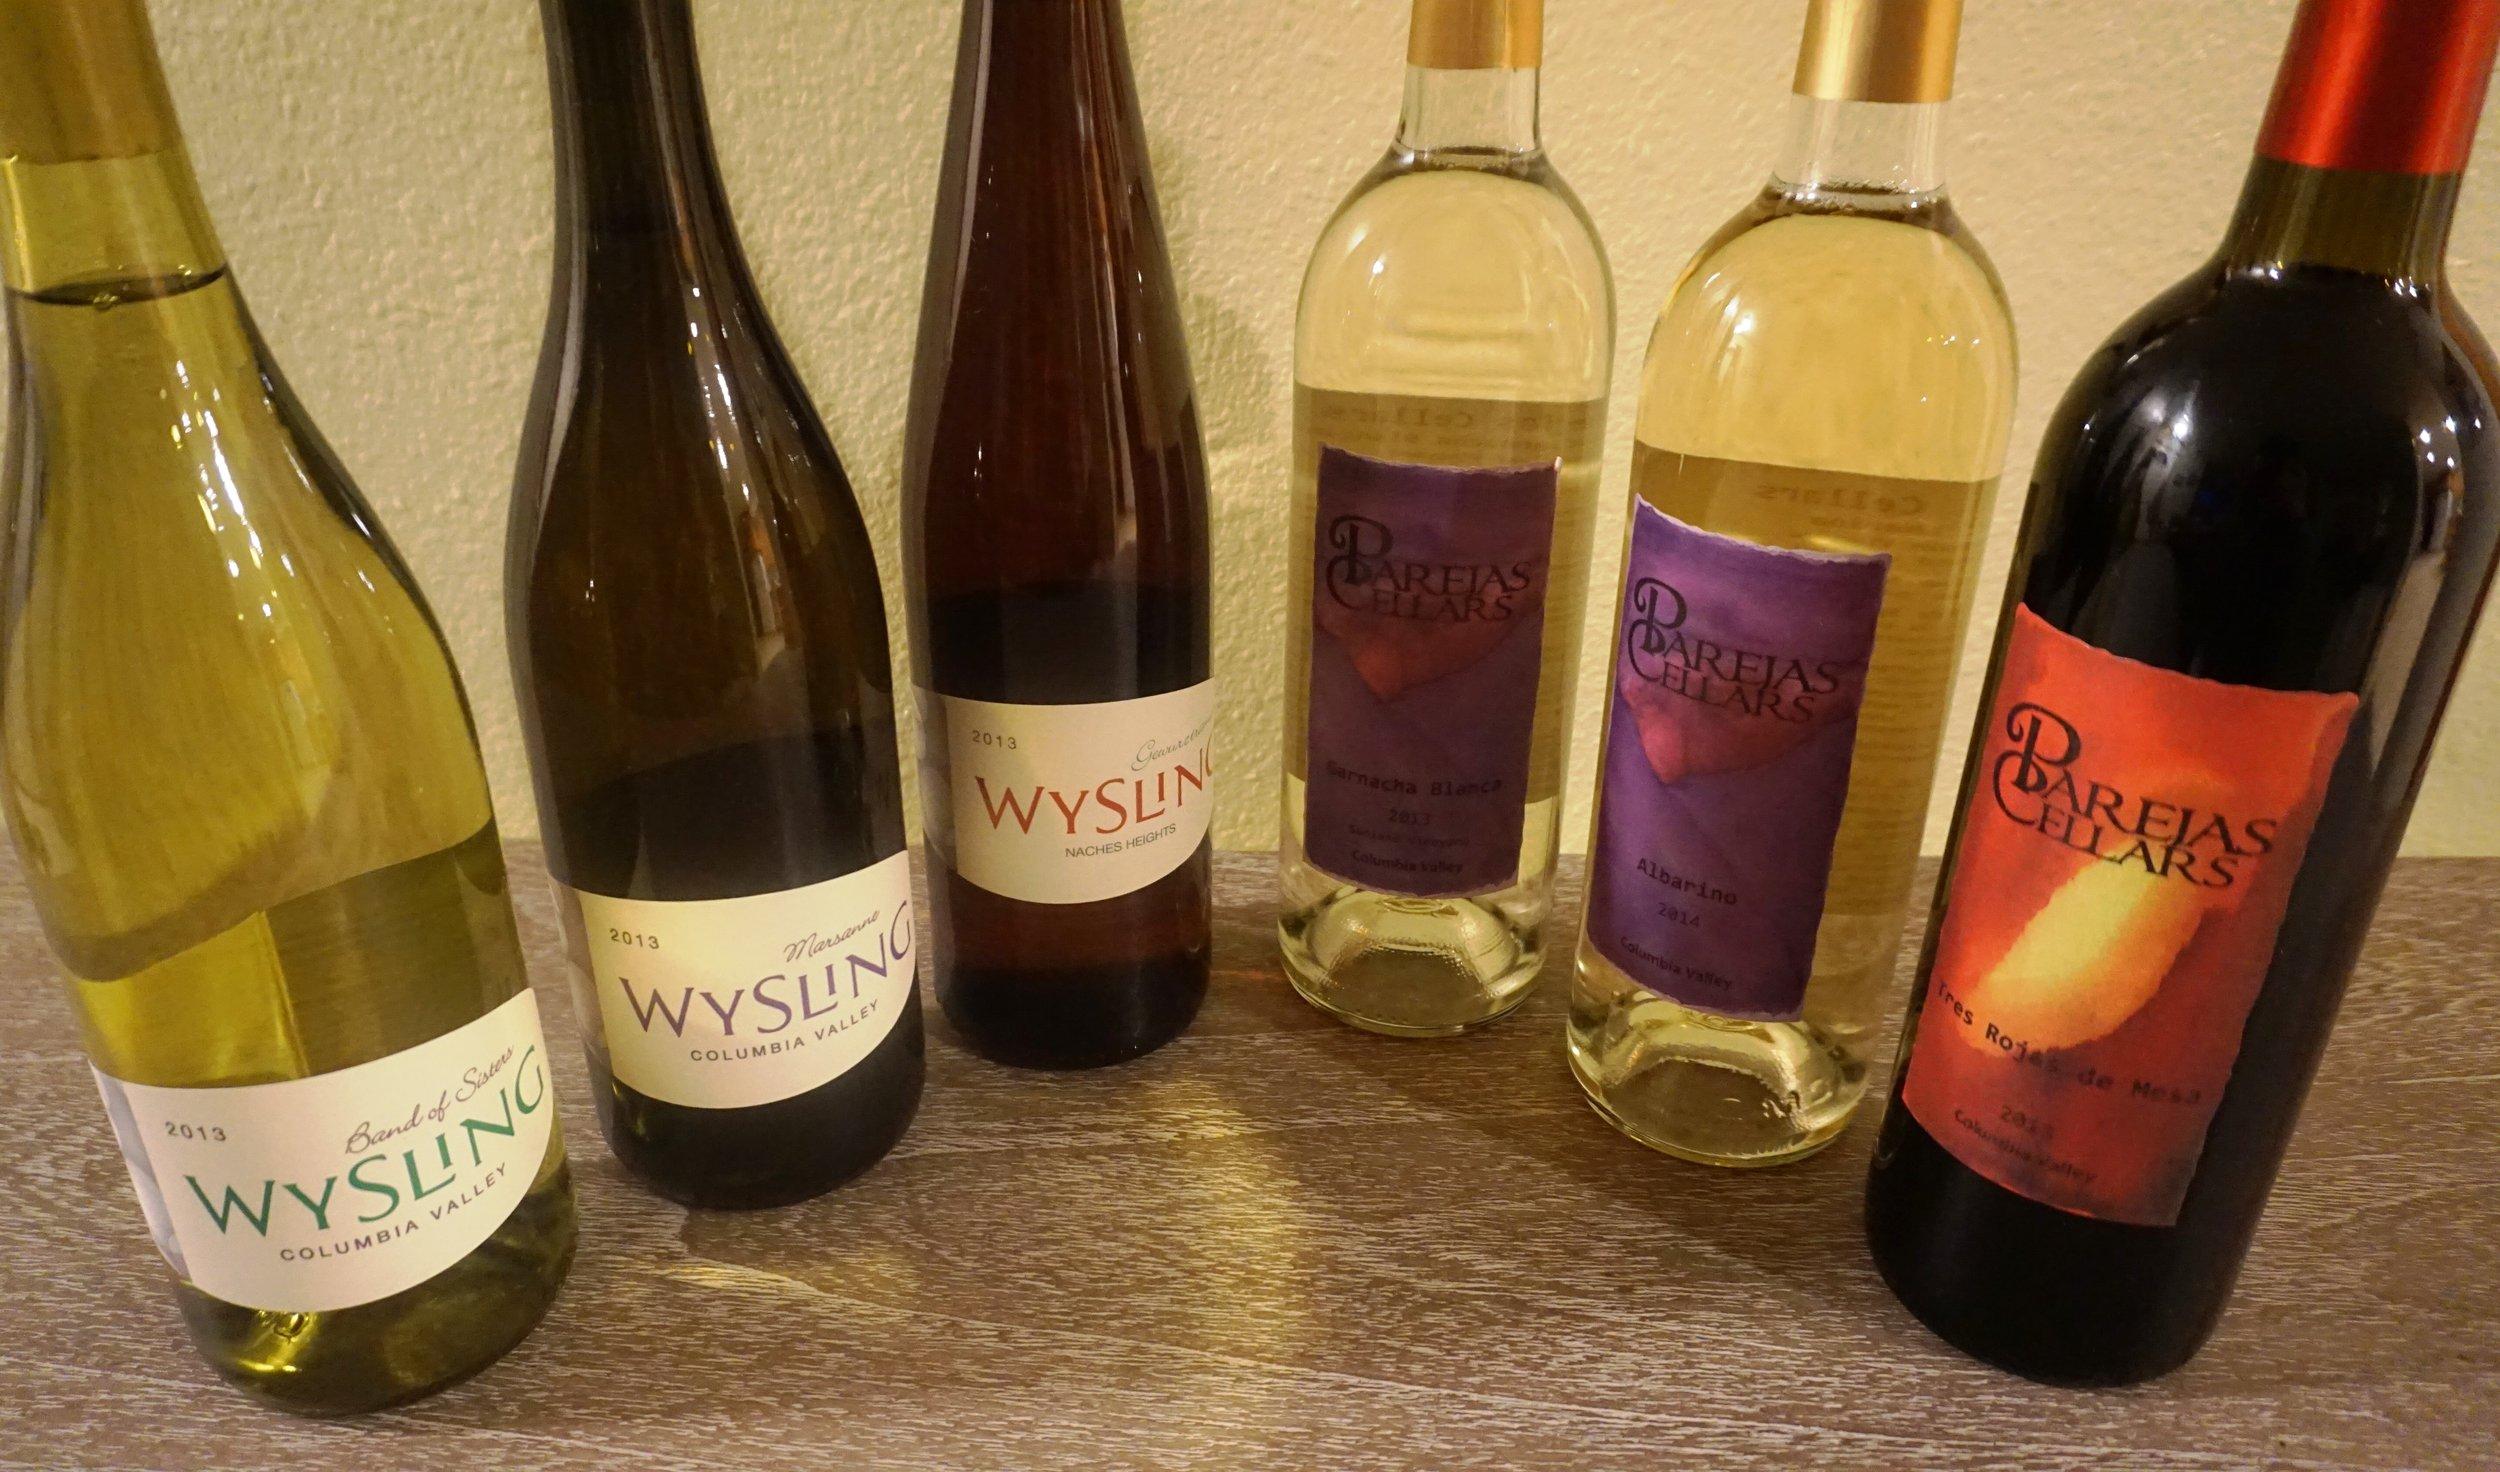 Winemaker, Mark Wysling, focuses on Spanish varietals under the Parejas label and wines outside the Spanish focus with his second label—Wysling. Viki Eierdam